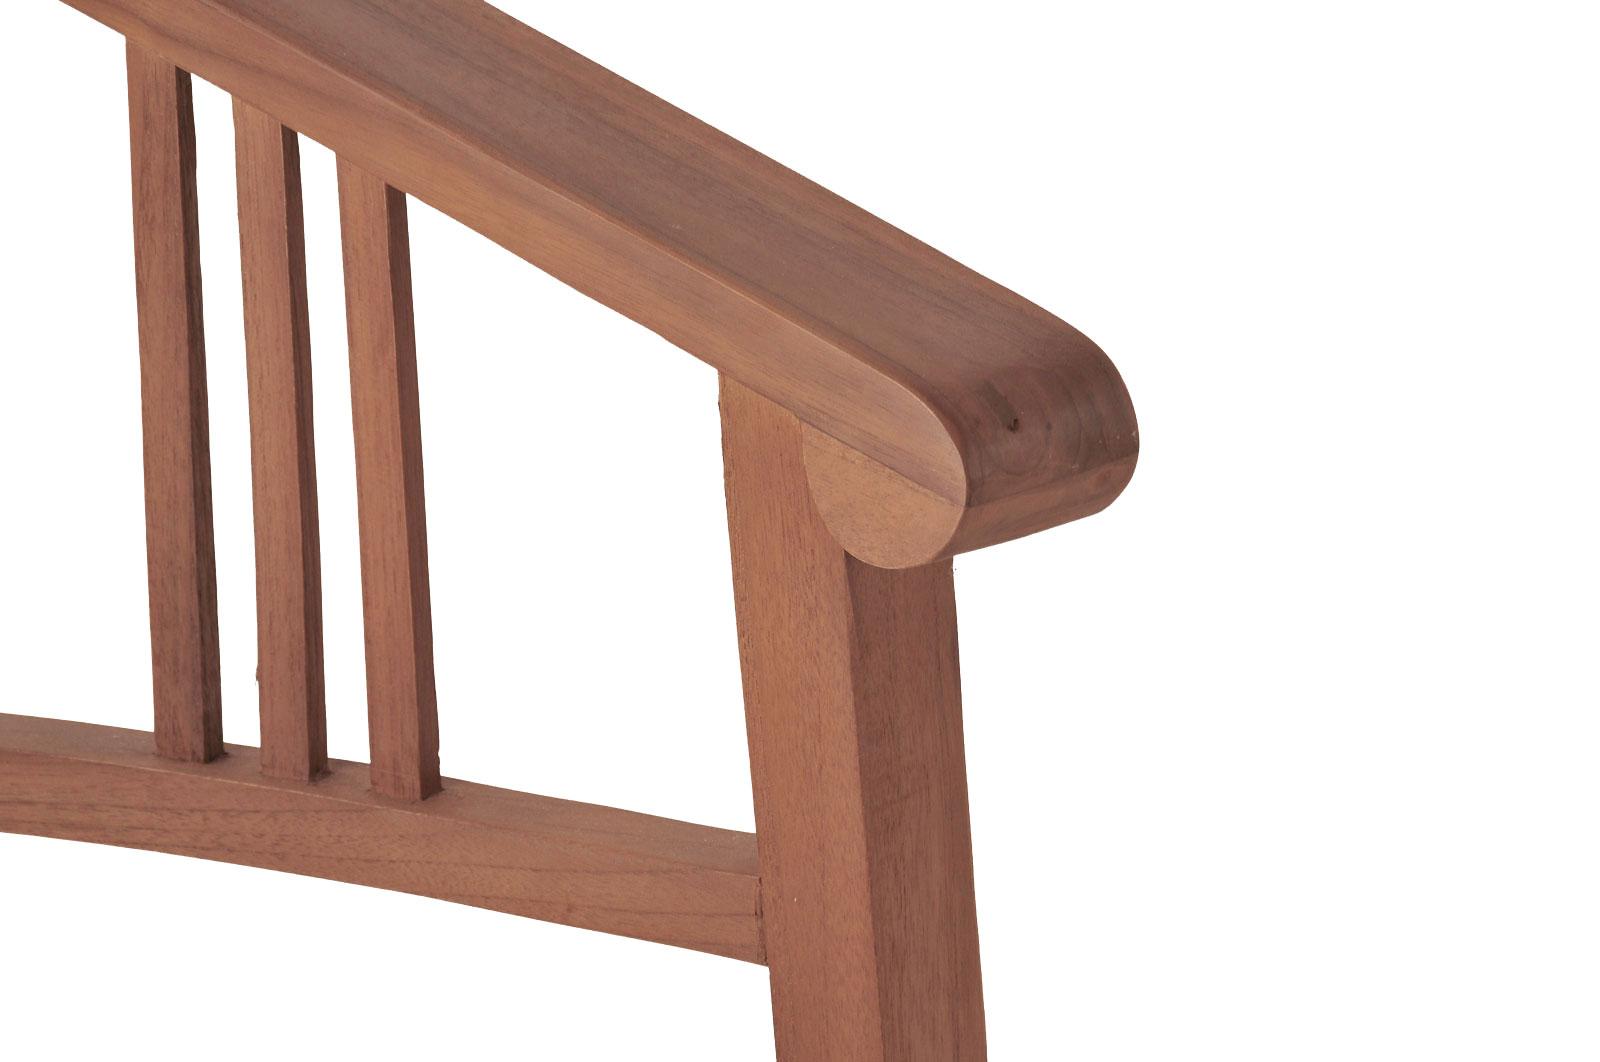 teak stuhl mit armlehne teak stuhl mit armlehne hause deko ideen gartenstuhl sessel teakstuhl. Black Bedroom Furniture Sets. Home Design Ideas